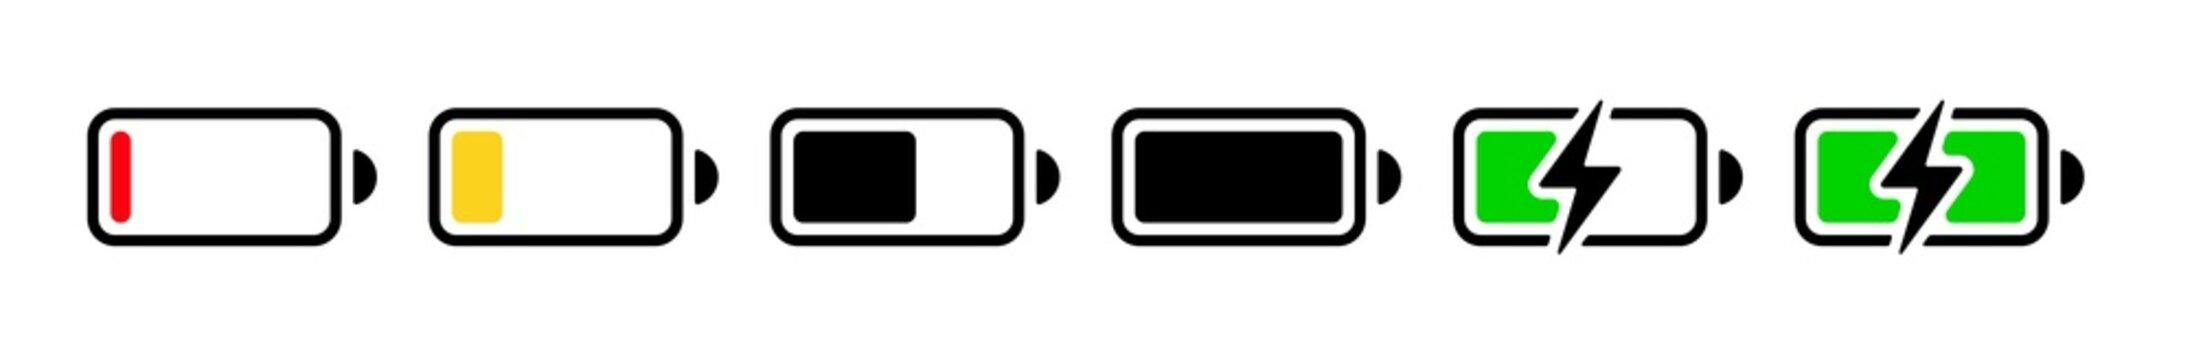 Charging battery symbols set. Vector icons on white background